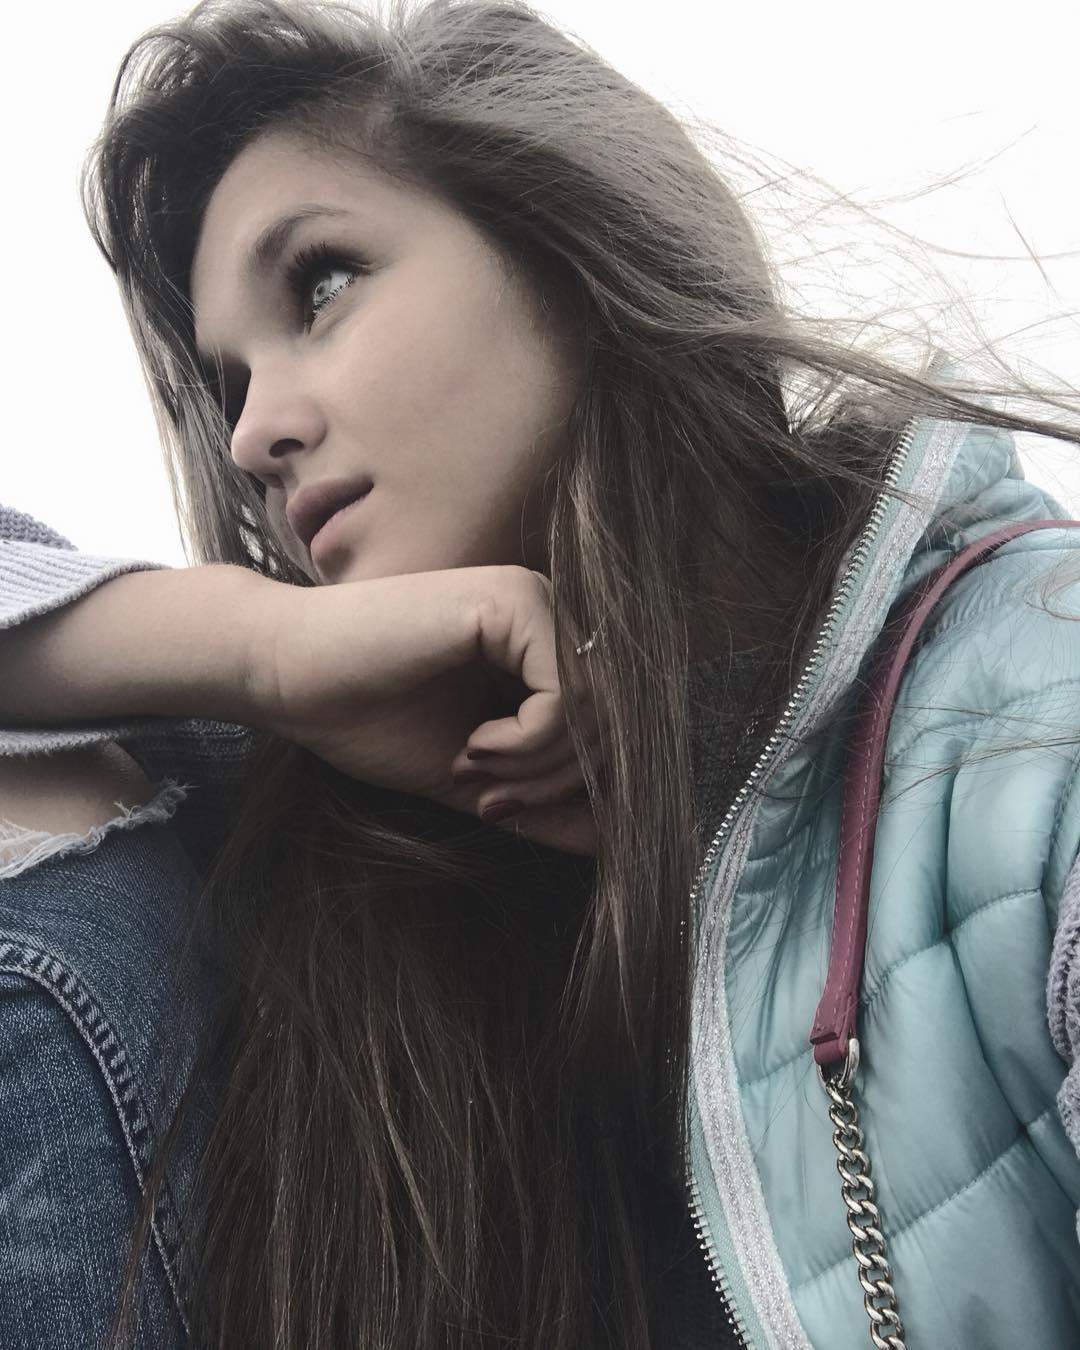 Александра Проклова - Страница 16 M_cK3_pkQtY